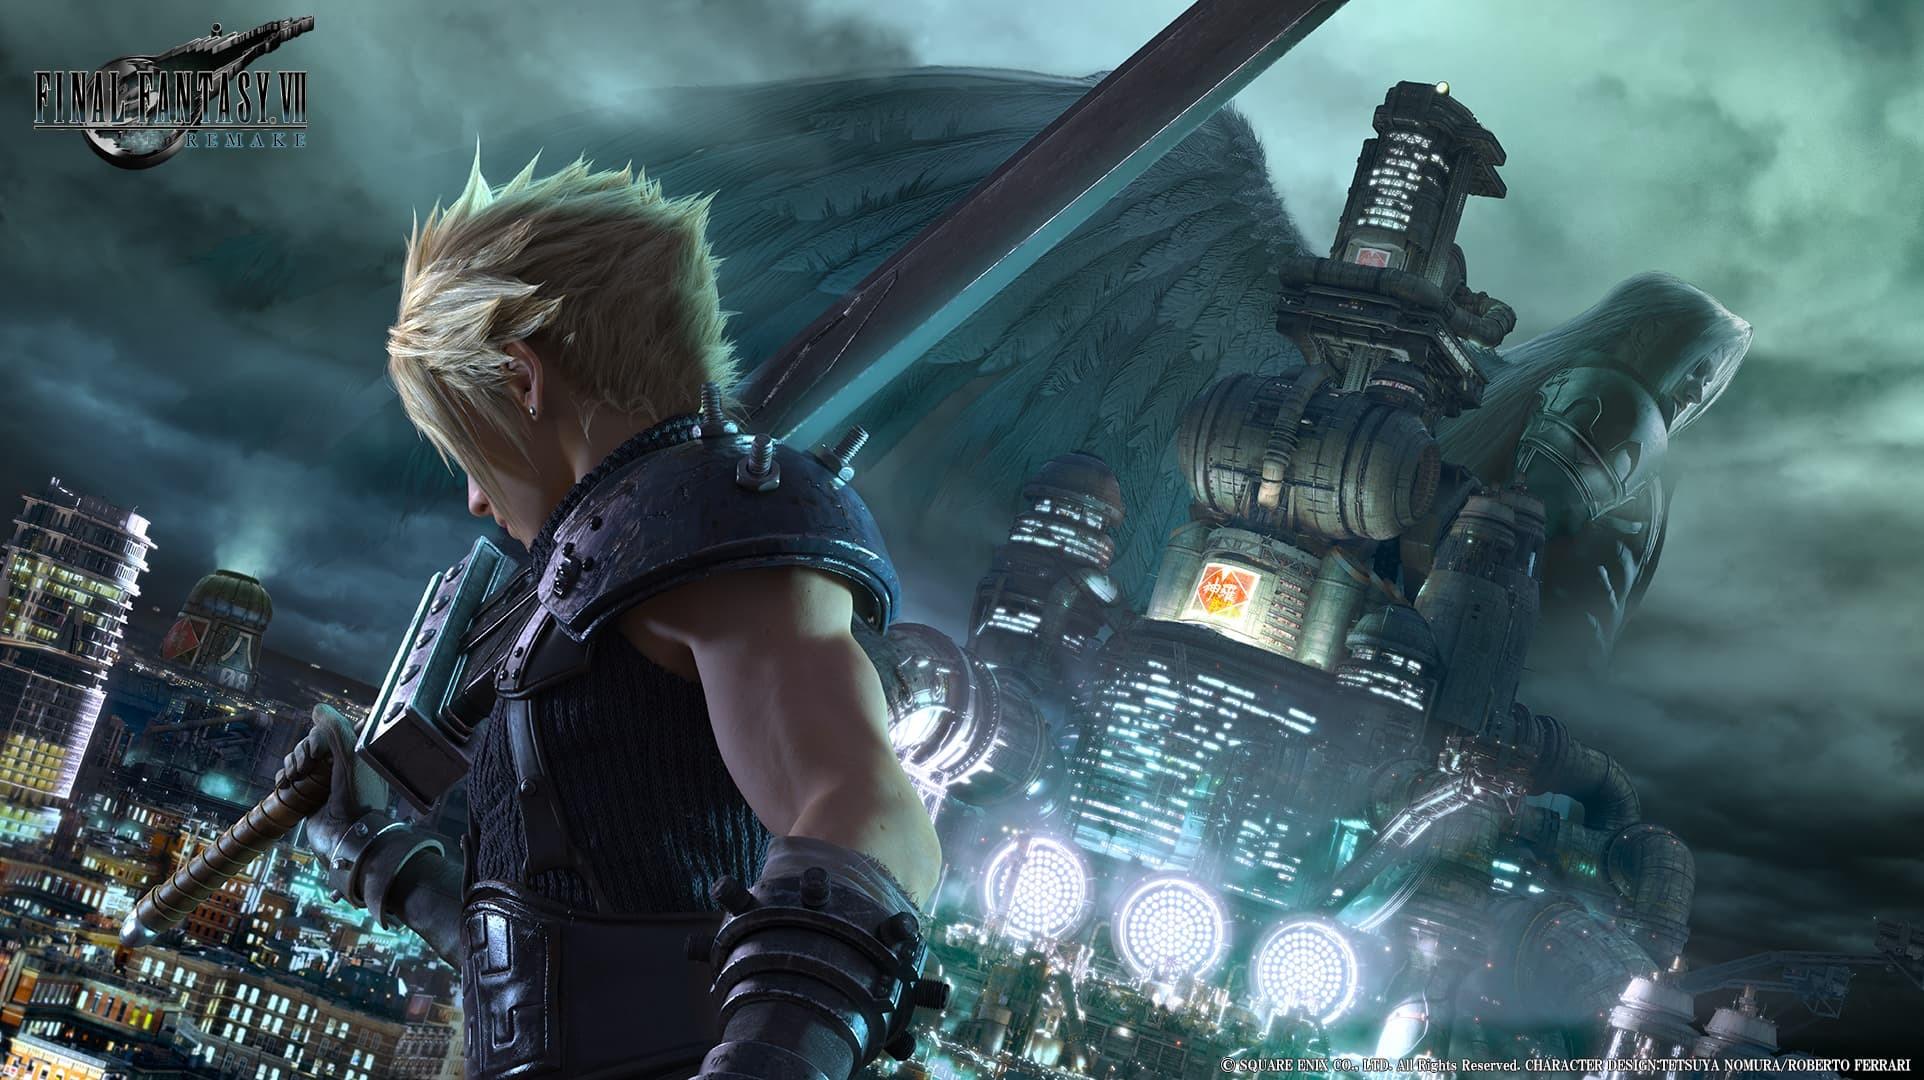 Final Fantasy VII Remake artwork presskit